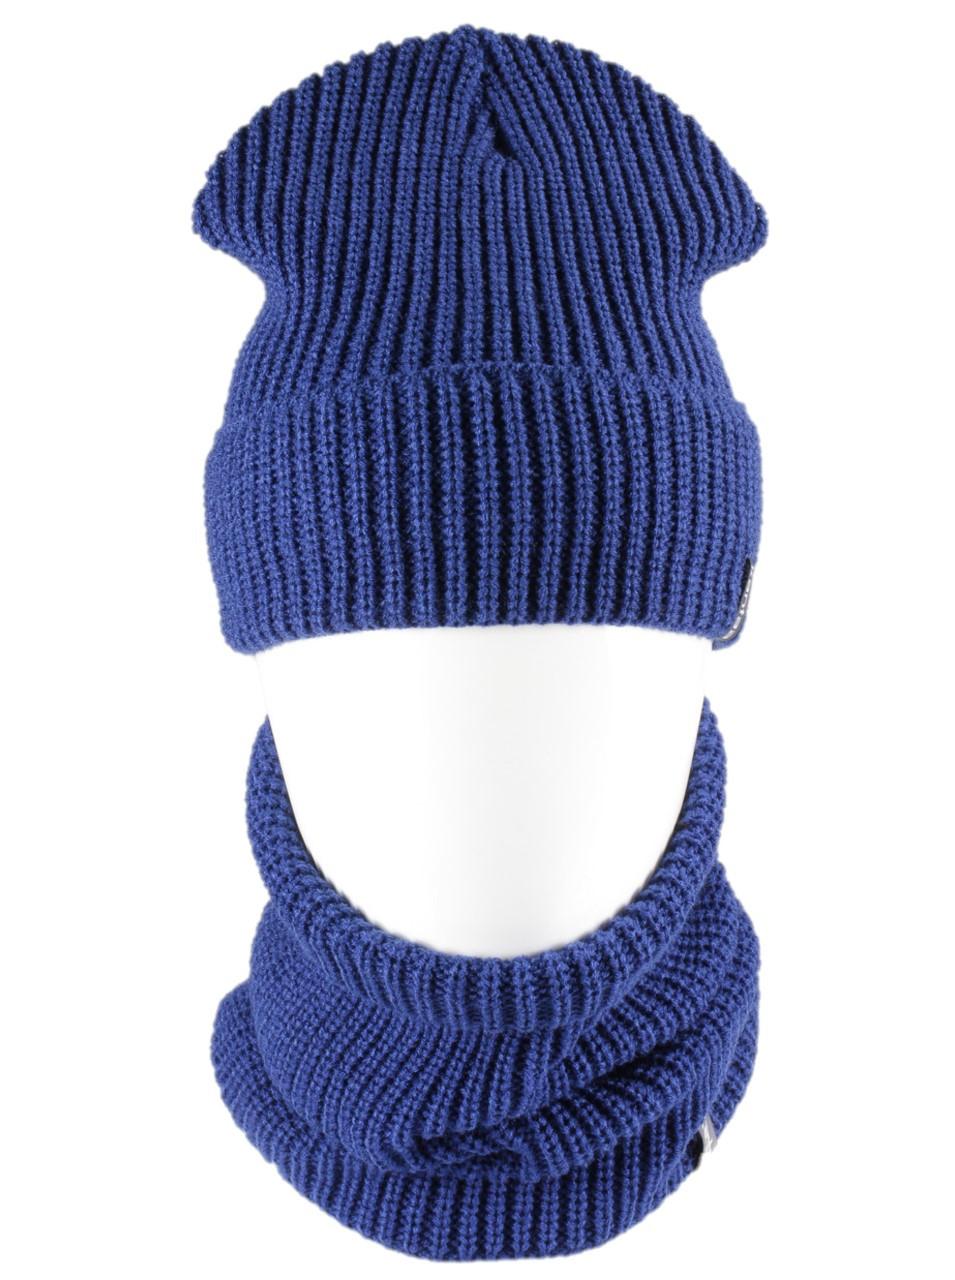 Вязаная шапка с Buff снуд КАНТА унисекс размер взрослый, синий (OC-093)